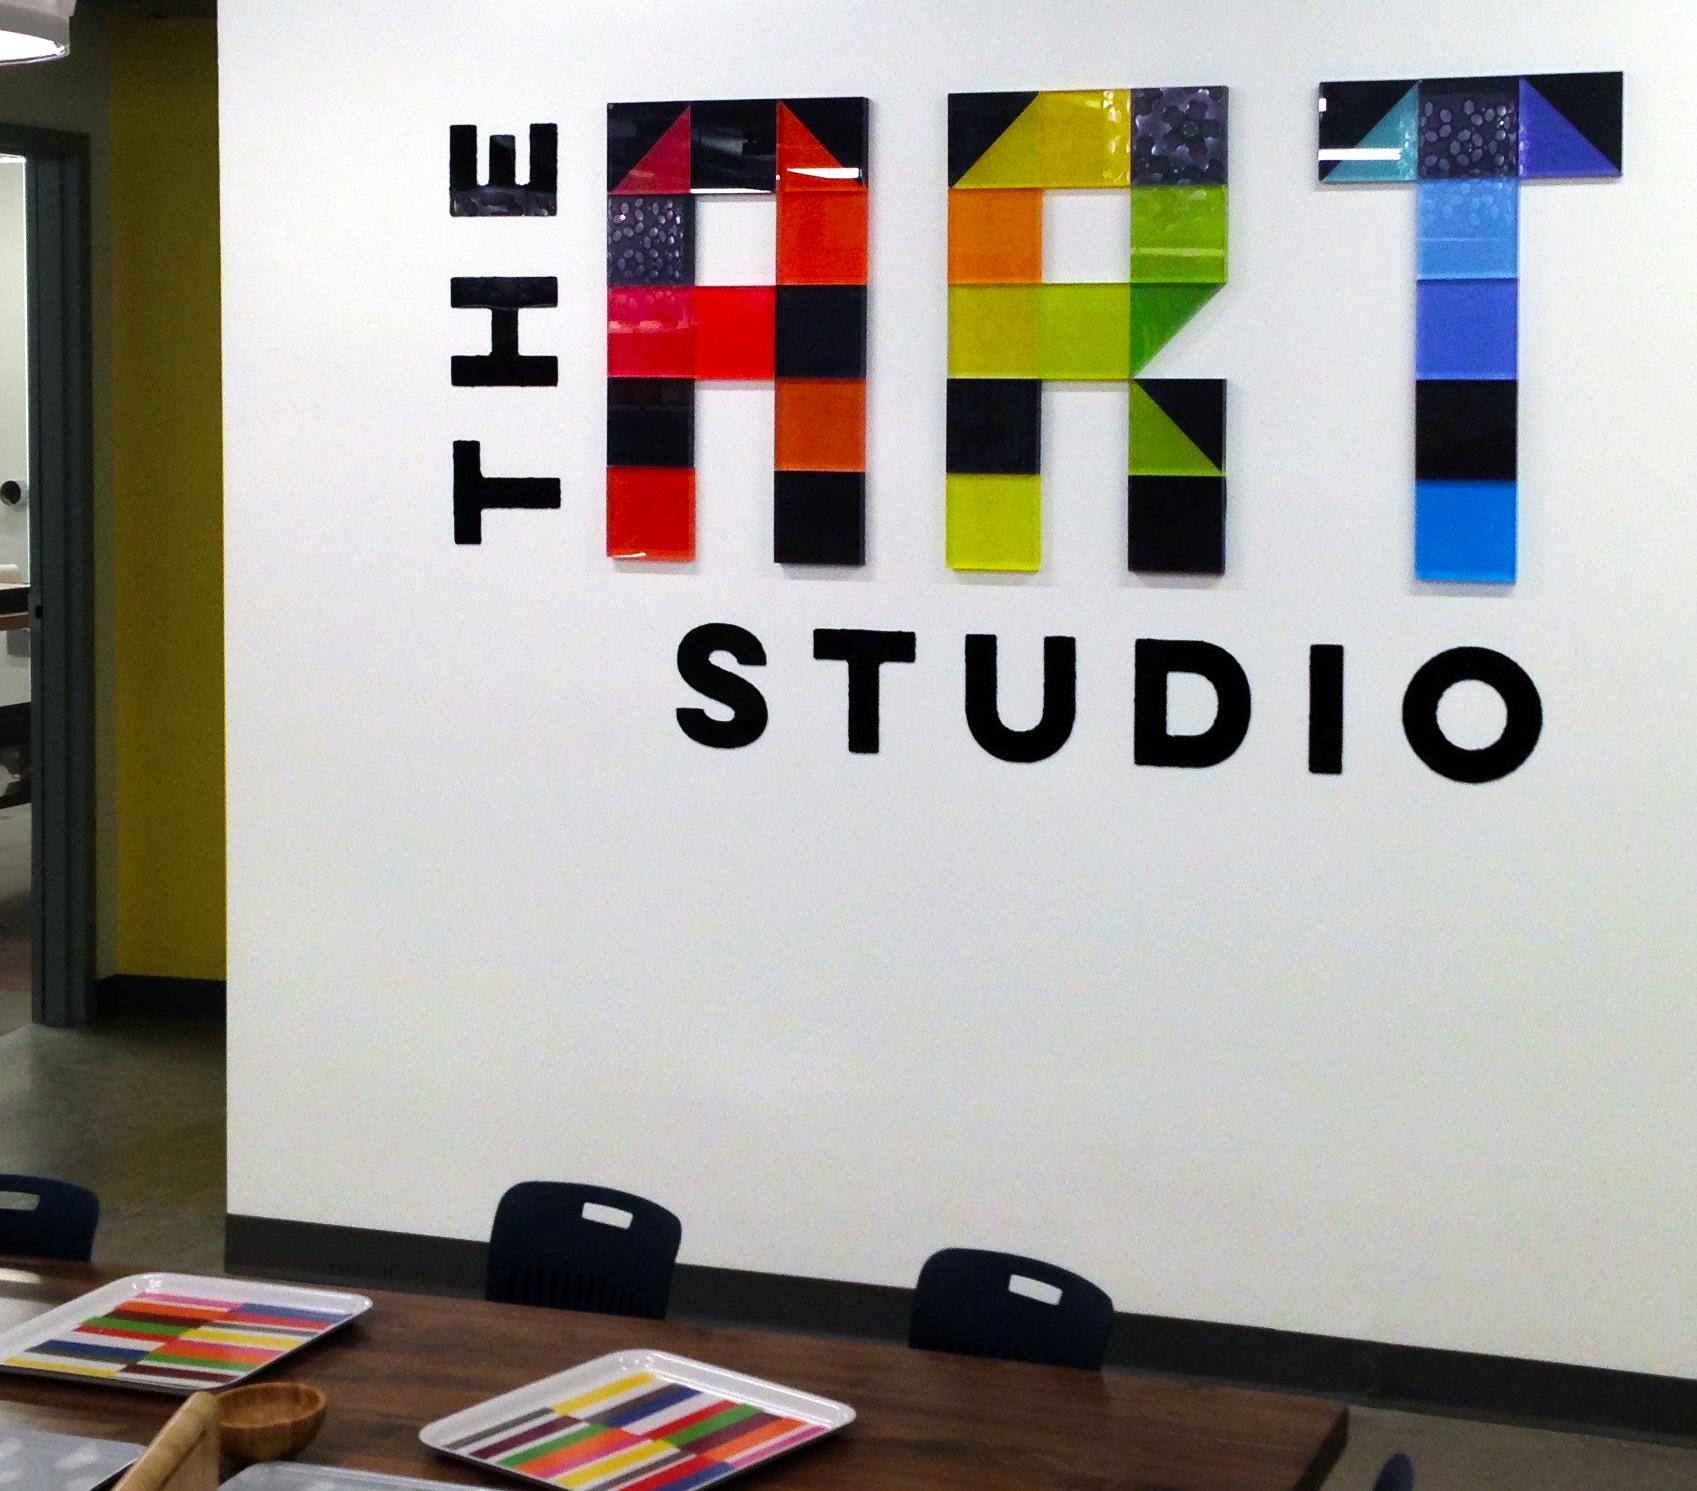 Art Studio Sign_final.jpg